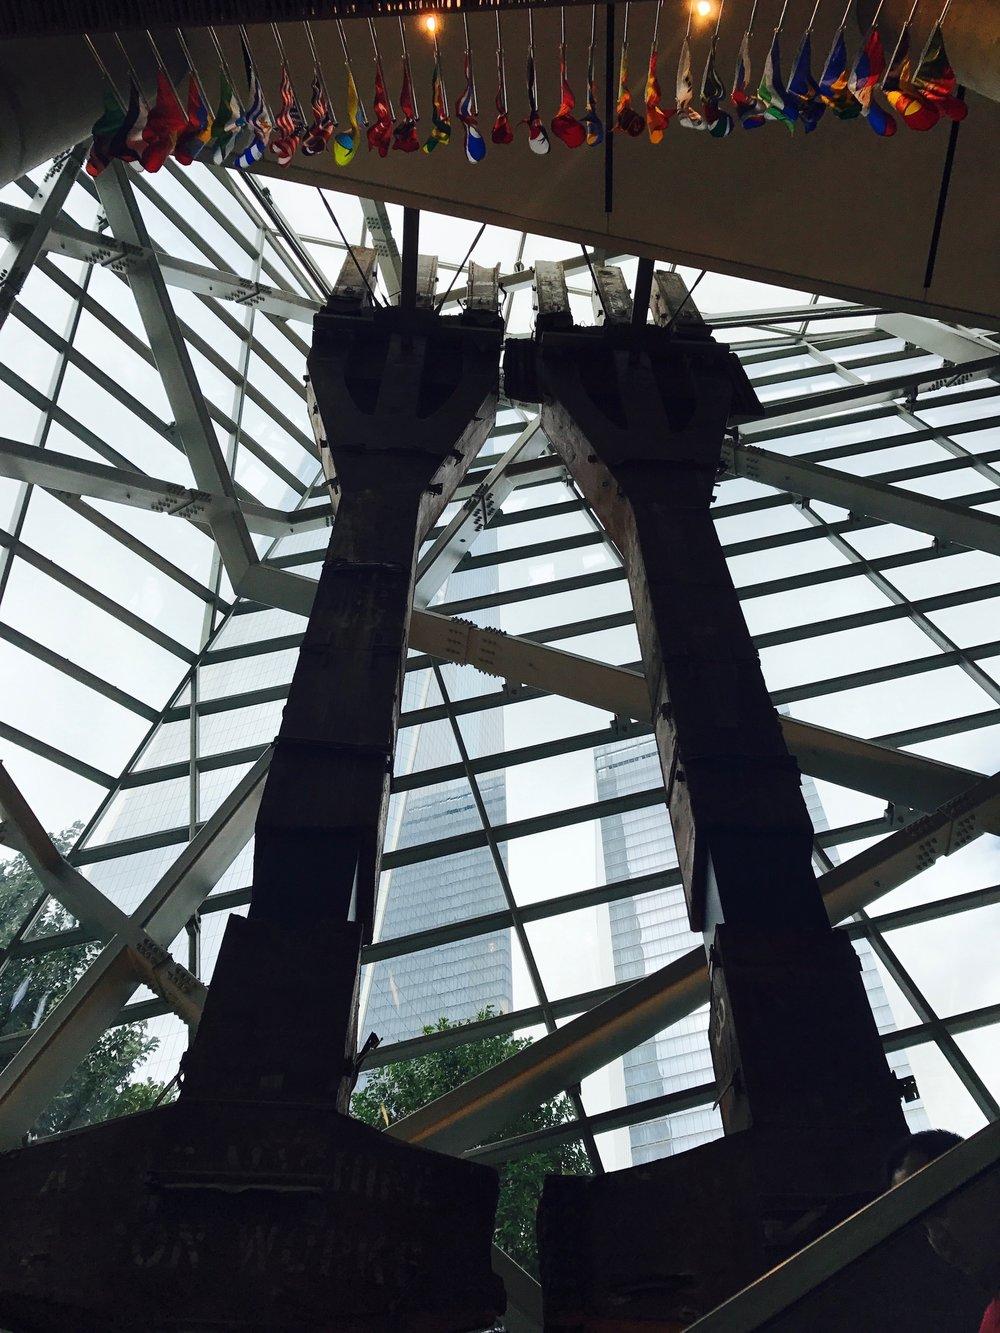 Ghosts of the original WTC as you enter the memorial